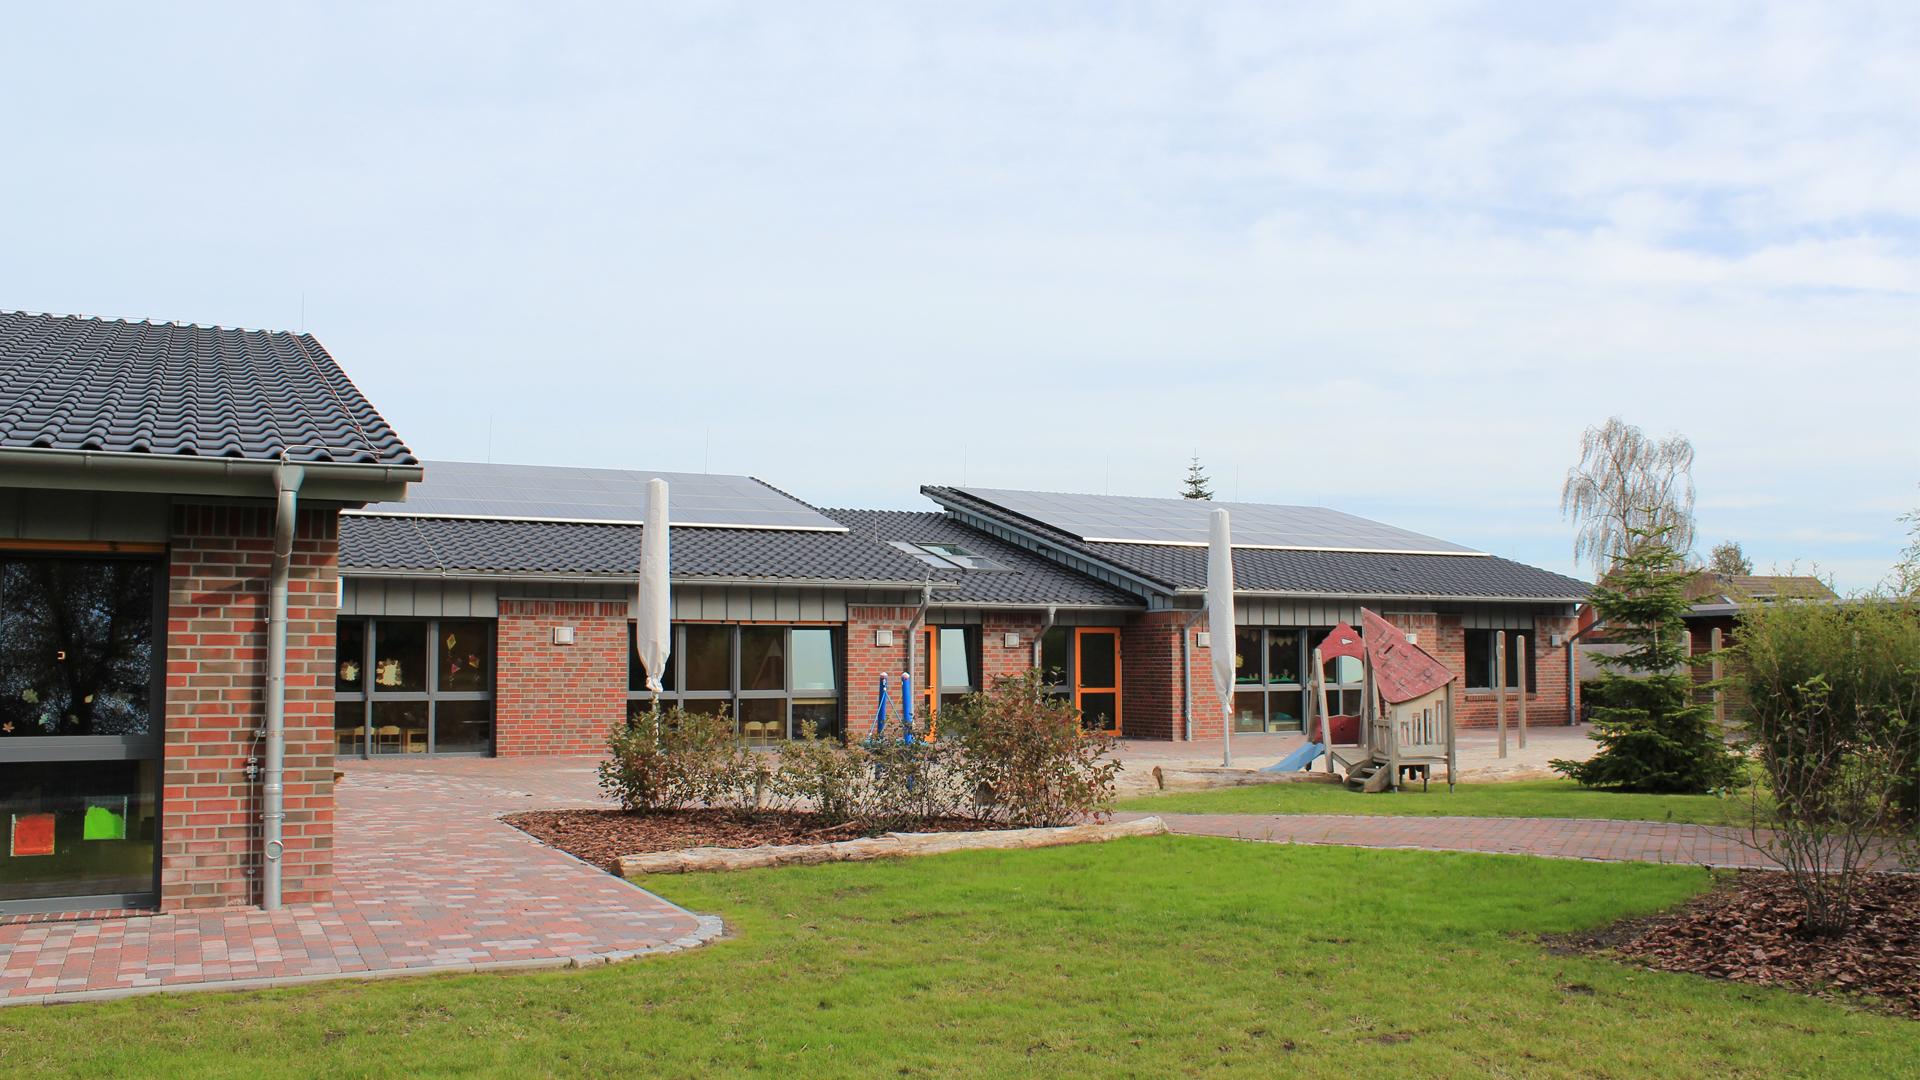 Neubau - Kindergarten & Krippe - Emden - 2012/2013